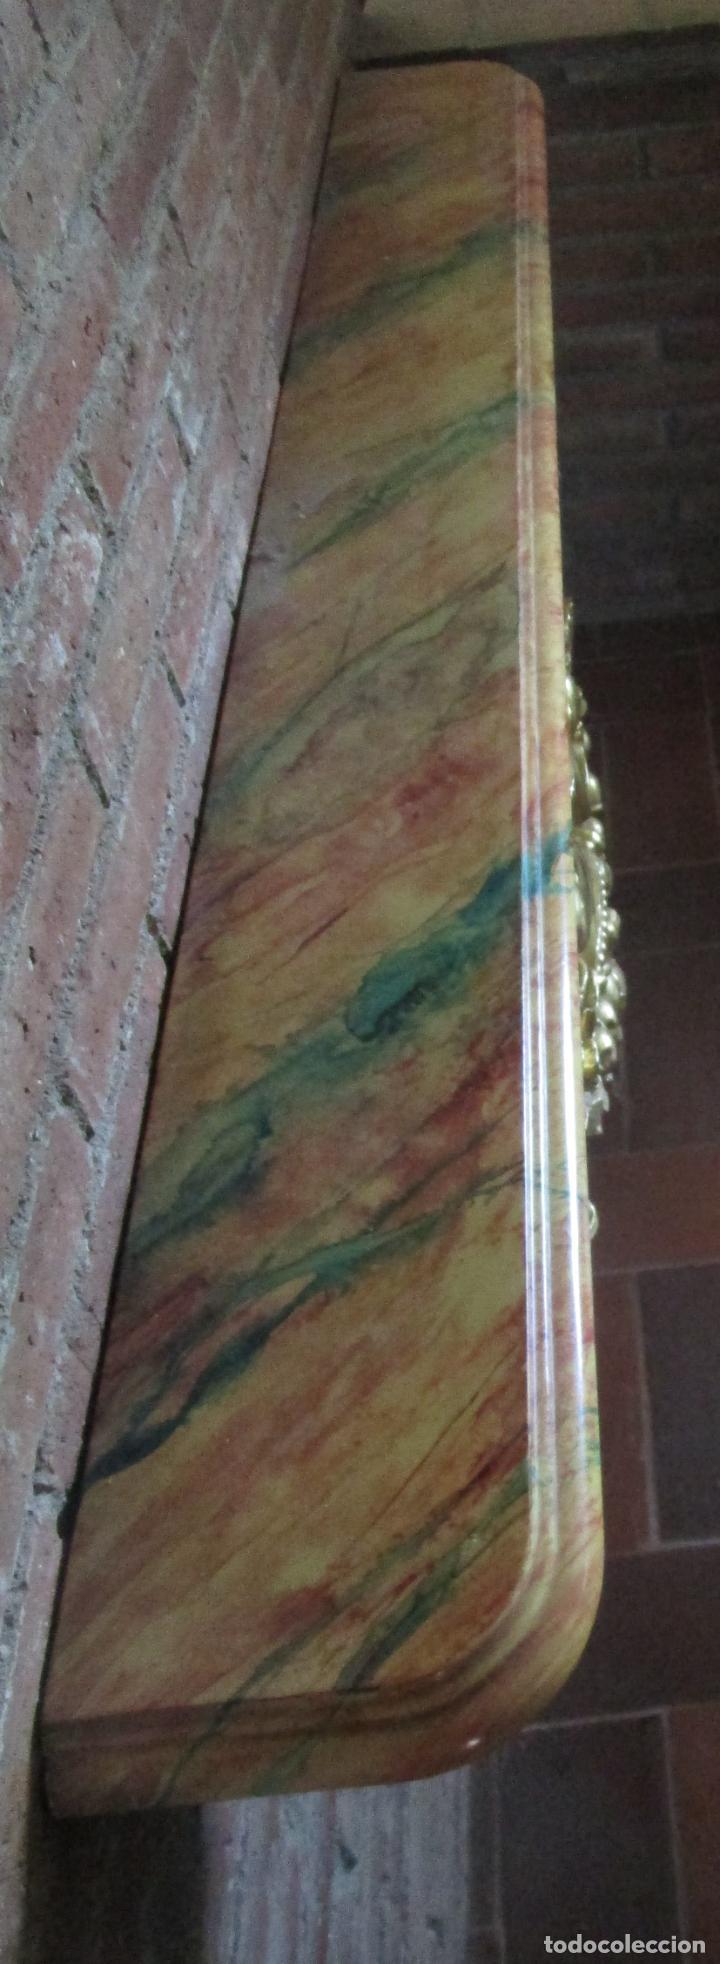 Arte: Bonita Consola, Ménsula Barroca - Peana - Retablo en Talla de Madera Dorada en Pan de Oro - S. XVIII - Foto 21 - 227996565